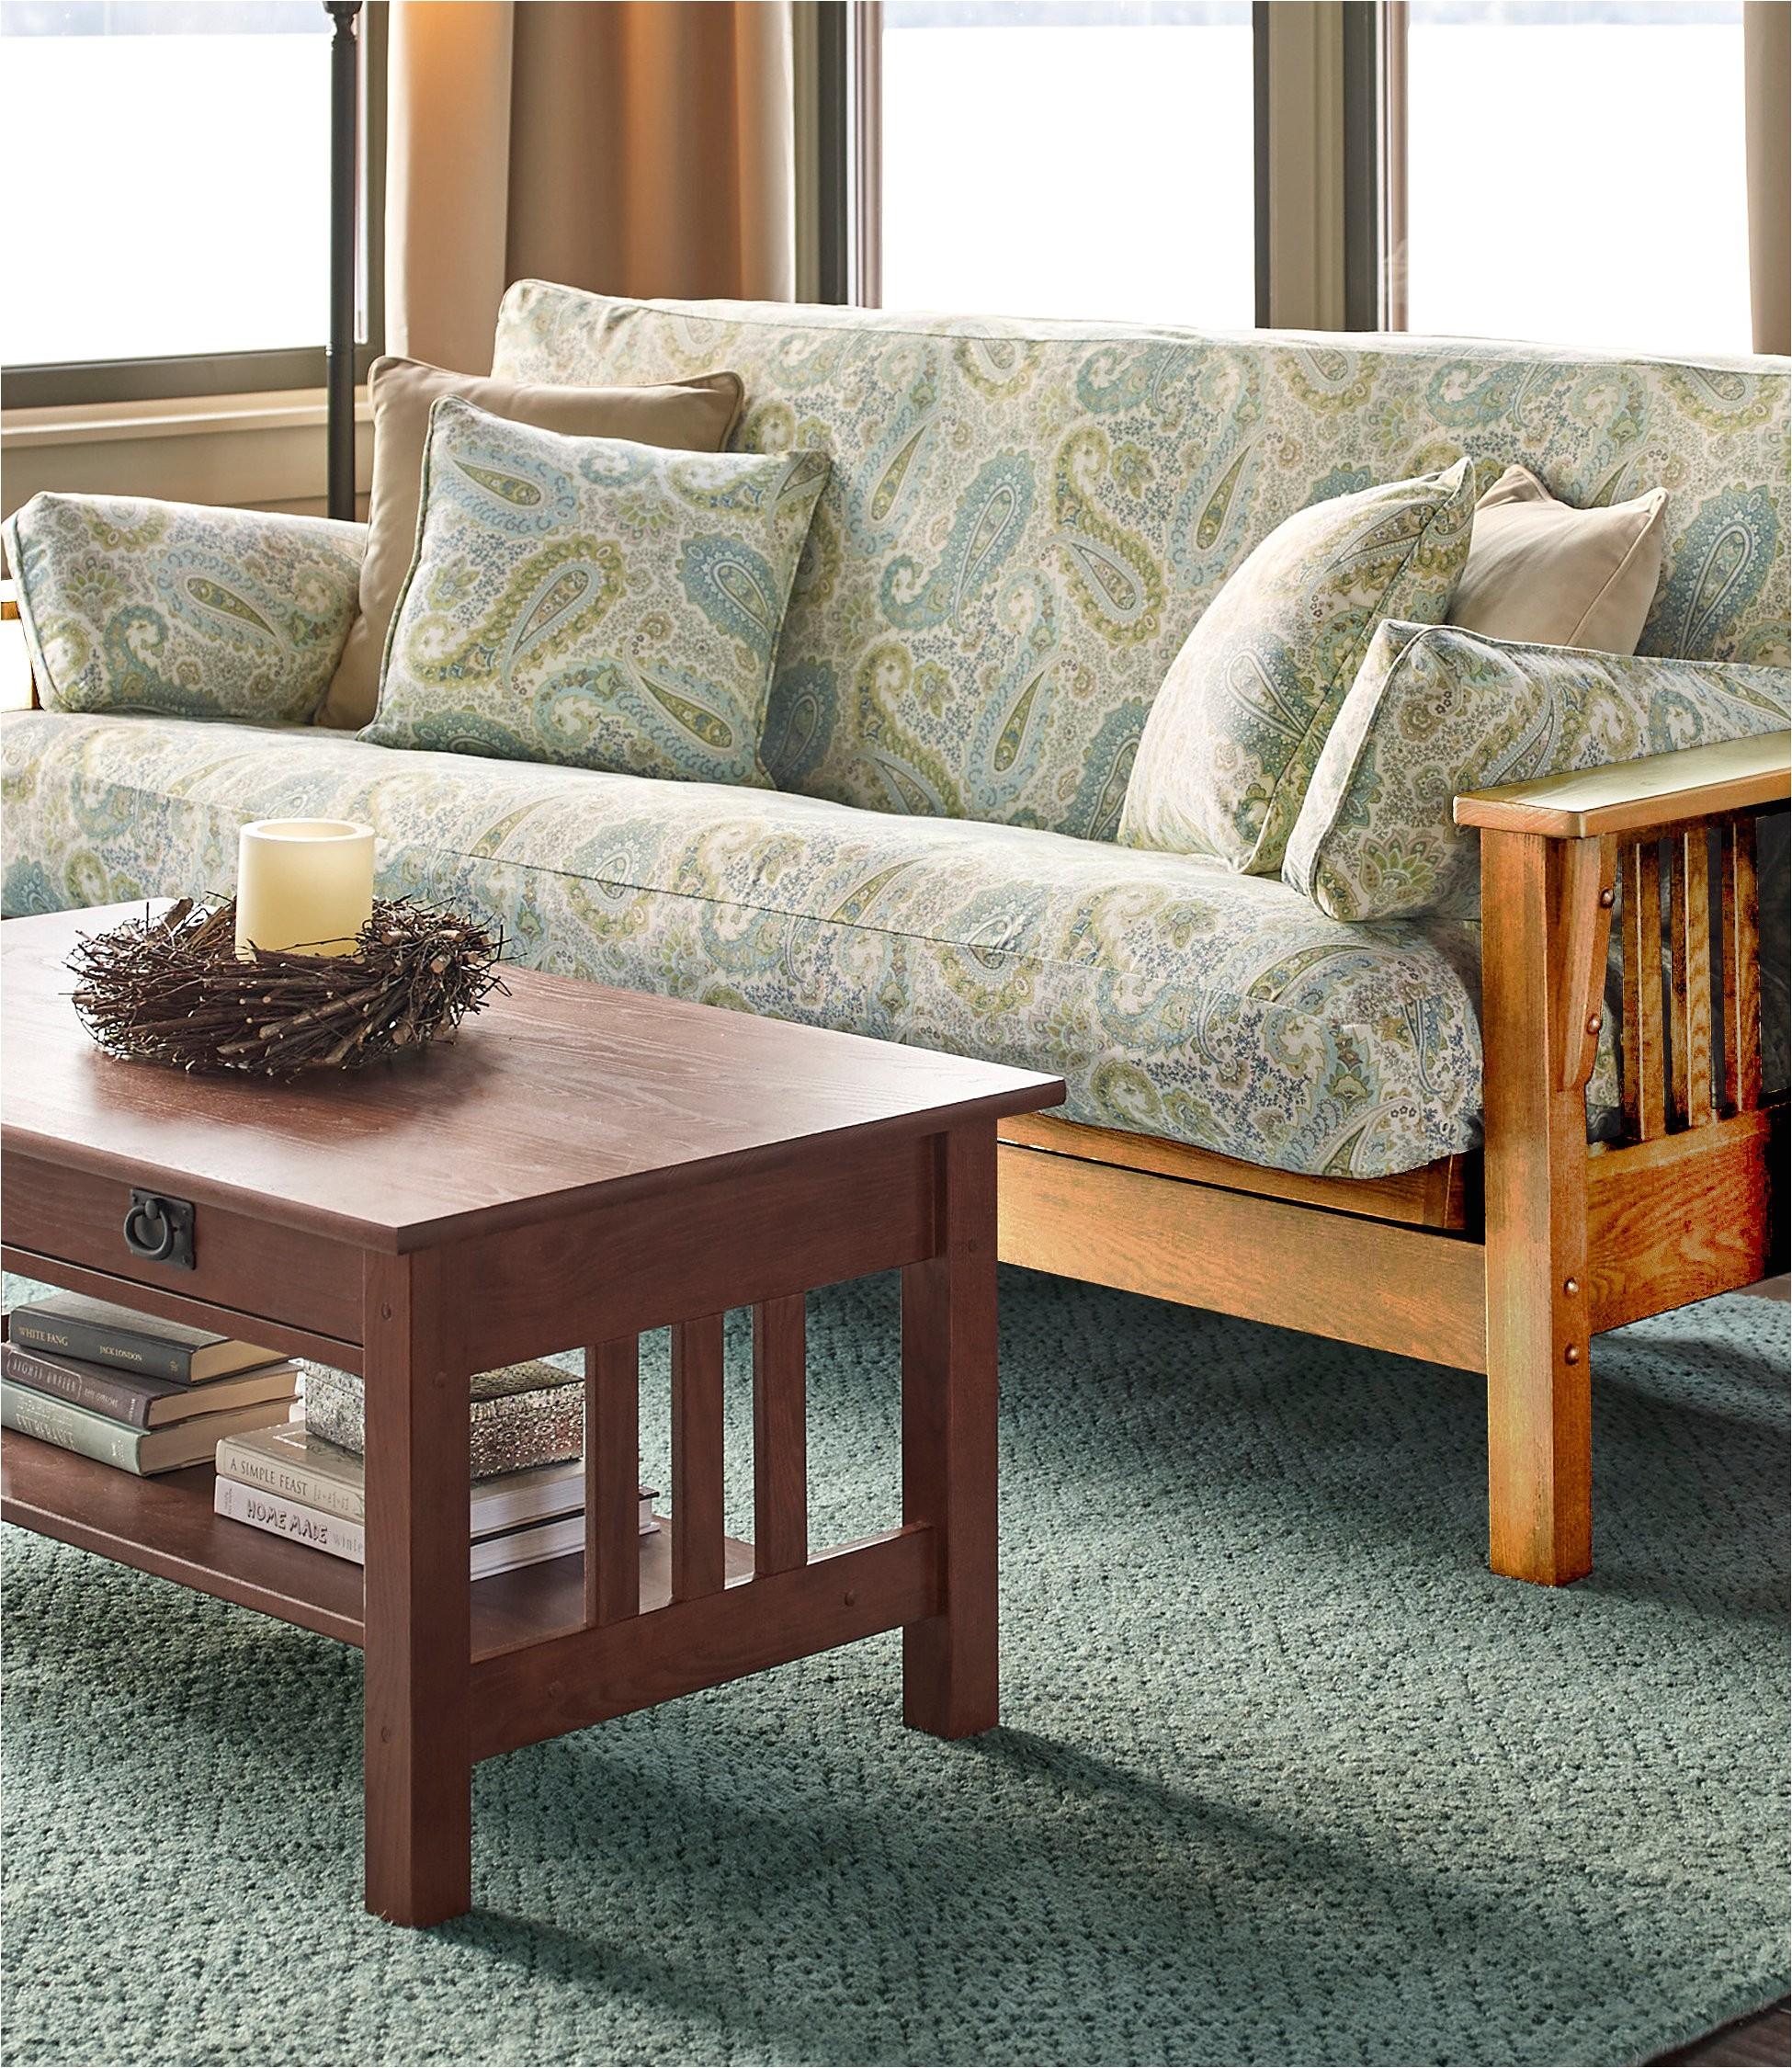 full size of uncategorized ll bean sofa covers slipcovers reviews sleeper futon bm furnititure outstanding